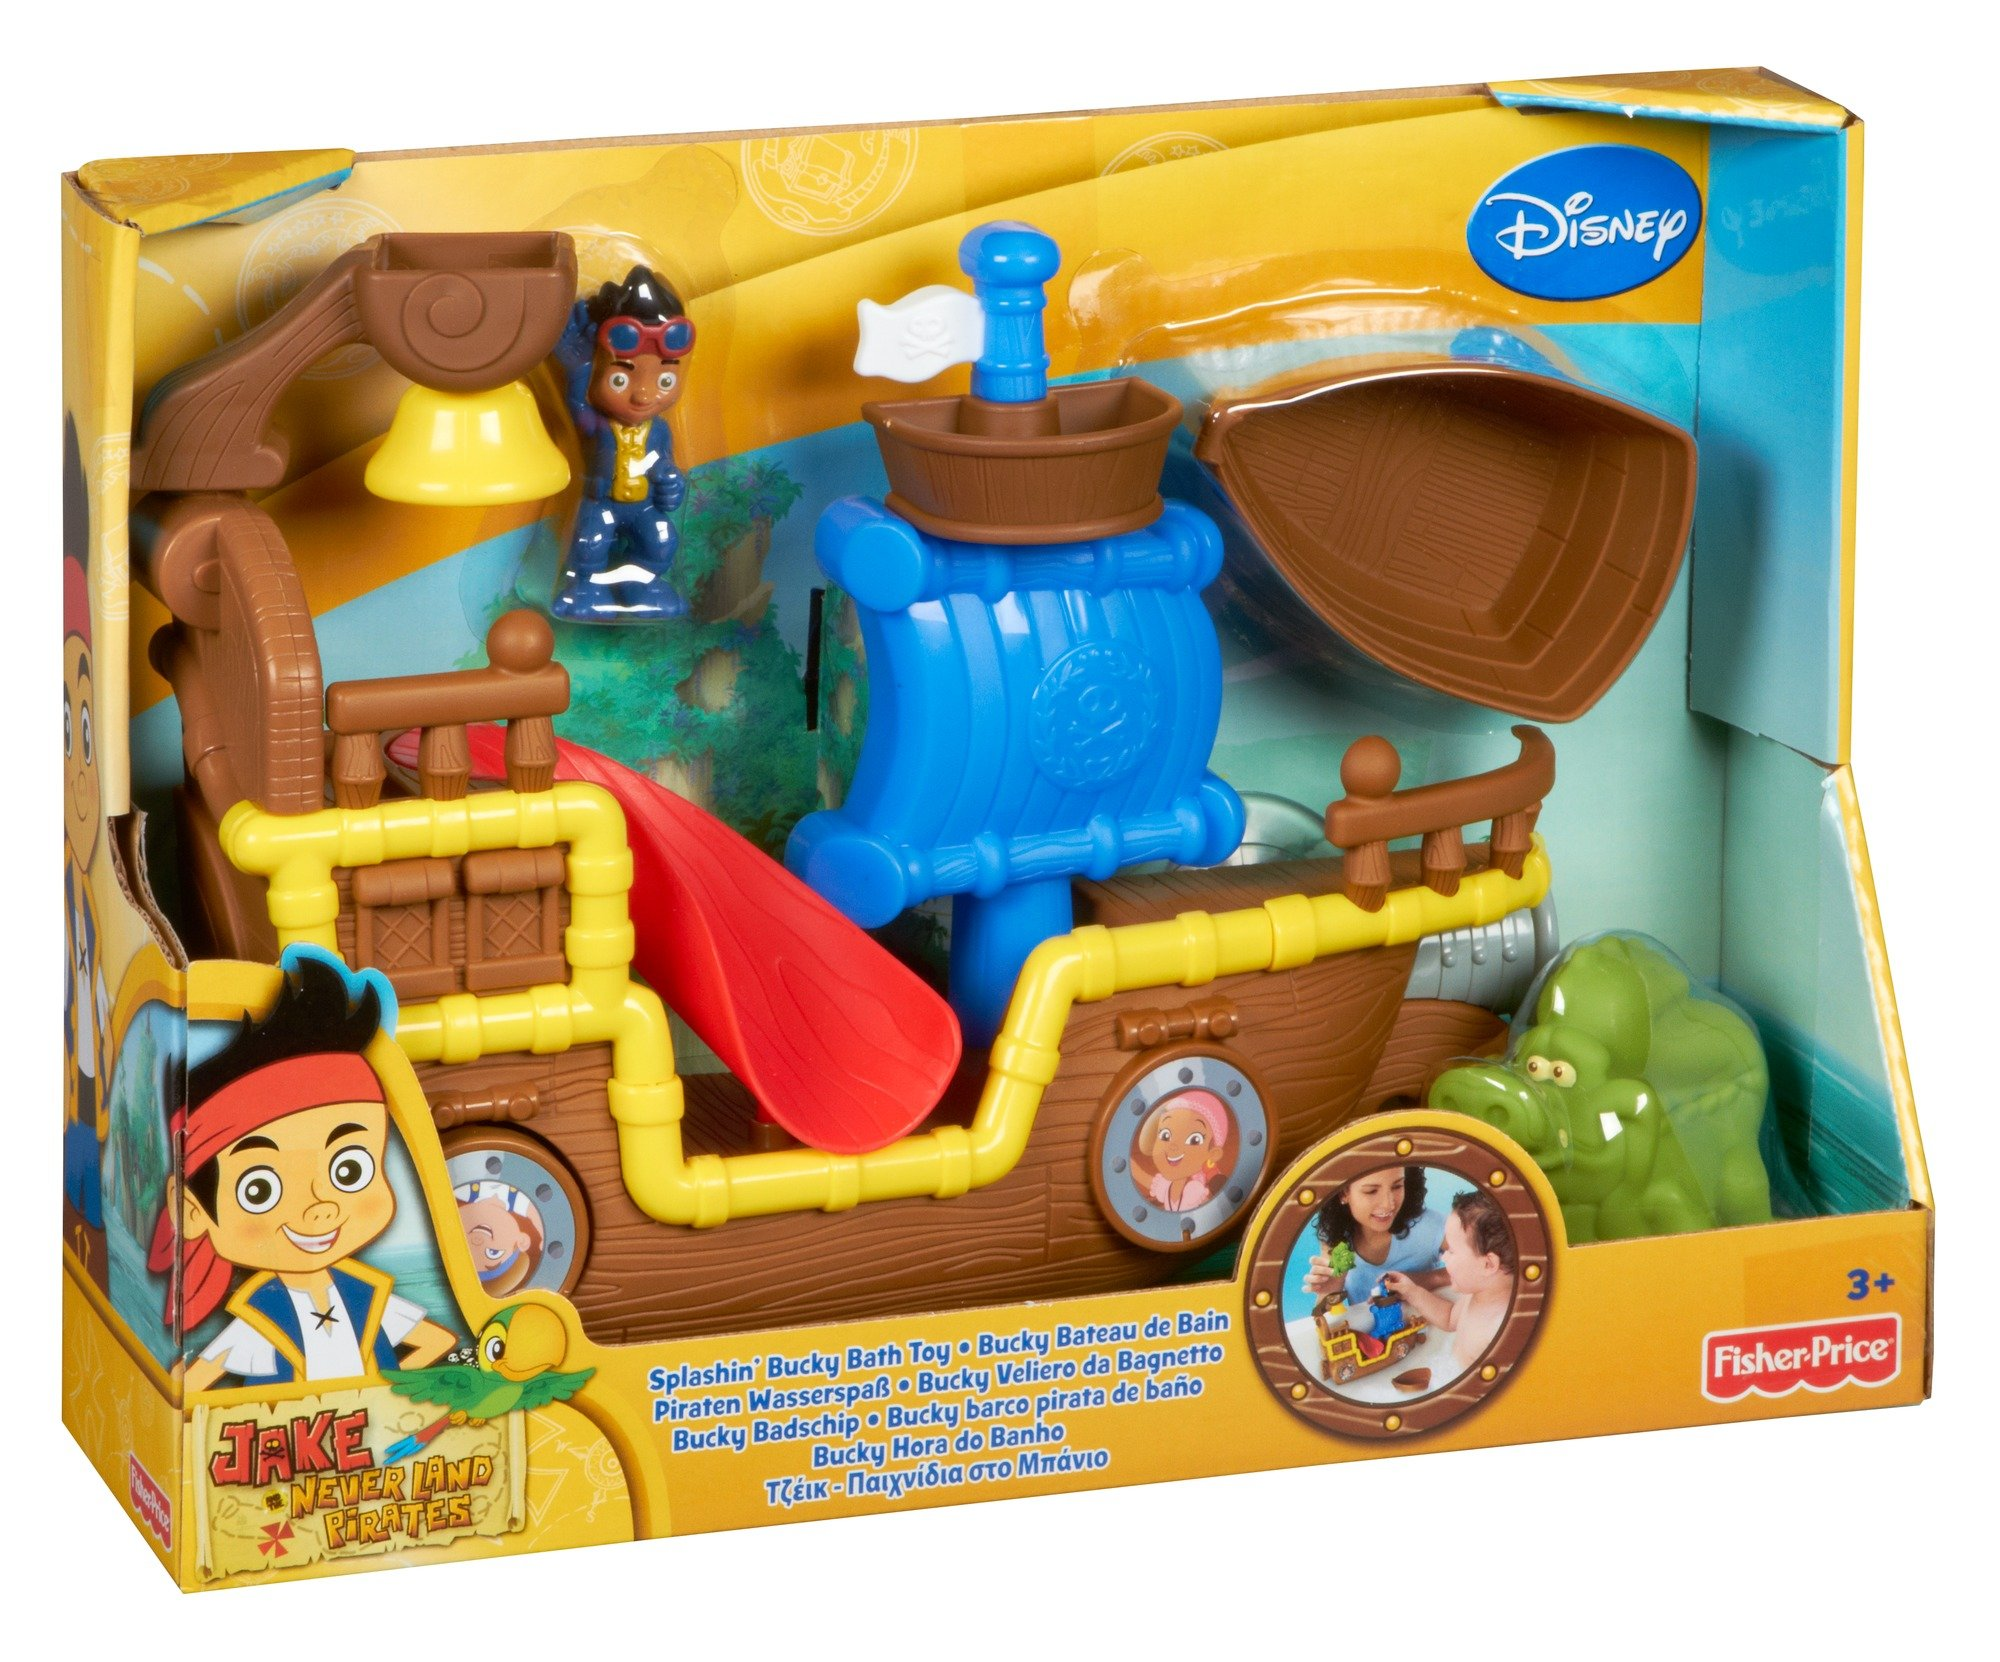 Fisher-Price Jake and the Never Land Pirates Splashin' Bucky Bath by Fisher-Price (Image #5)